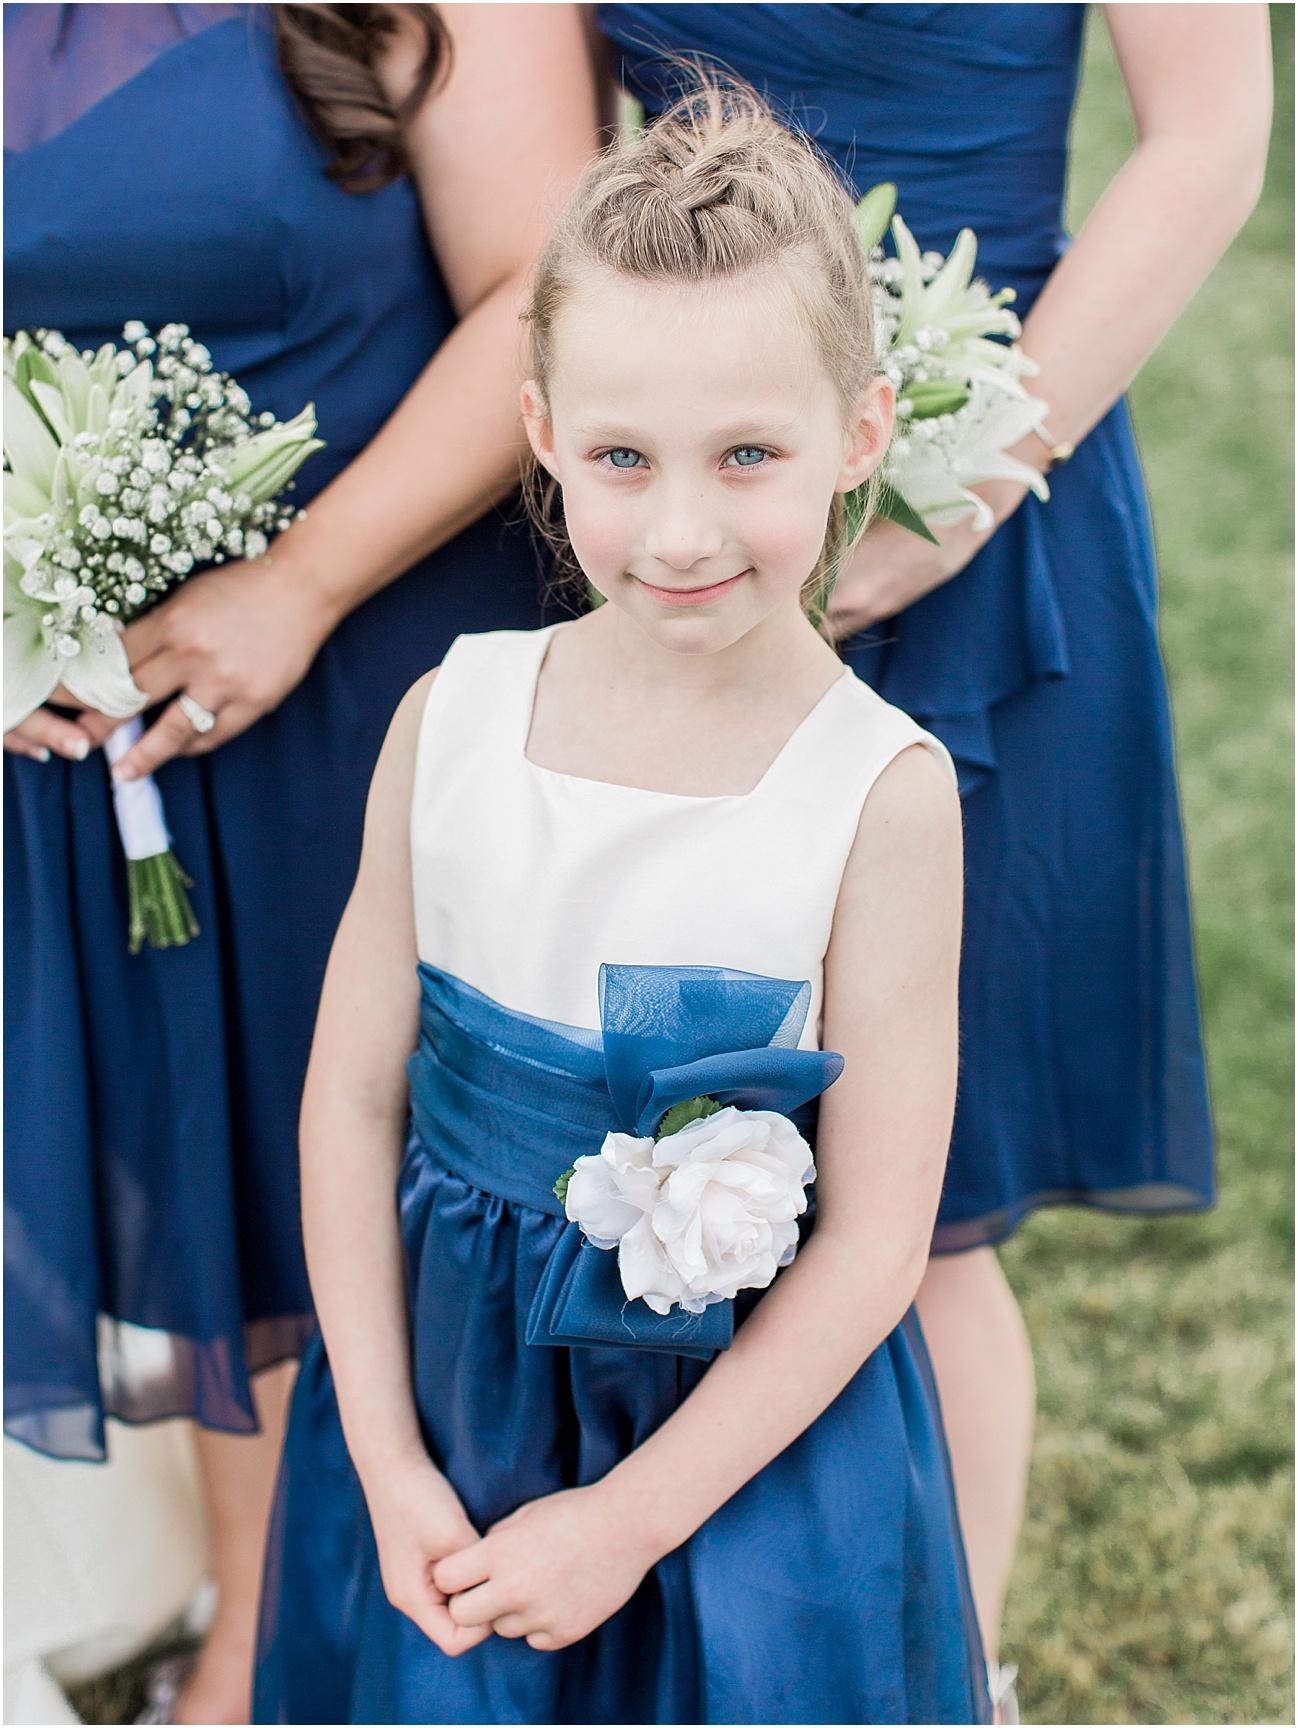 nicole_stephen_cape_club_nicky_falmouth_cod_boston_wedding_photographer_meredith_jane_photography_photo_0183.jpg